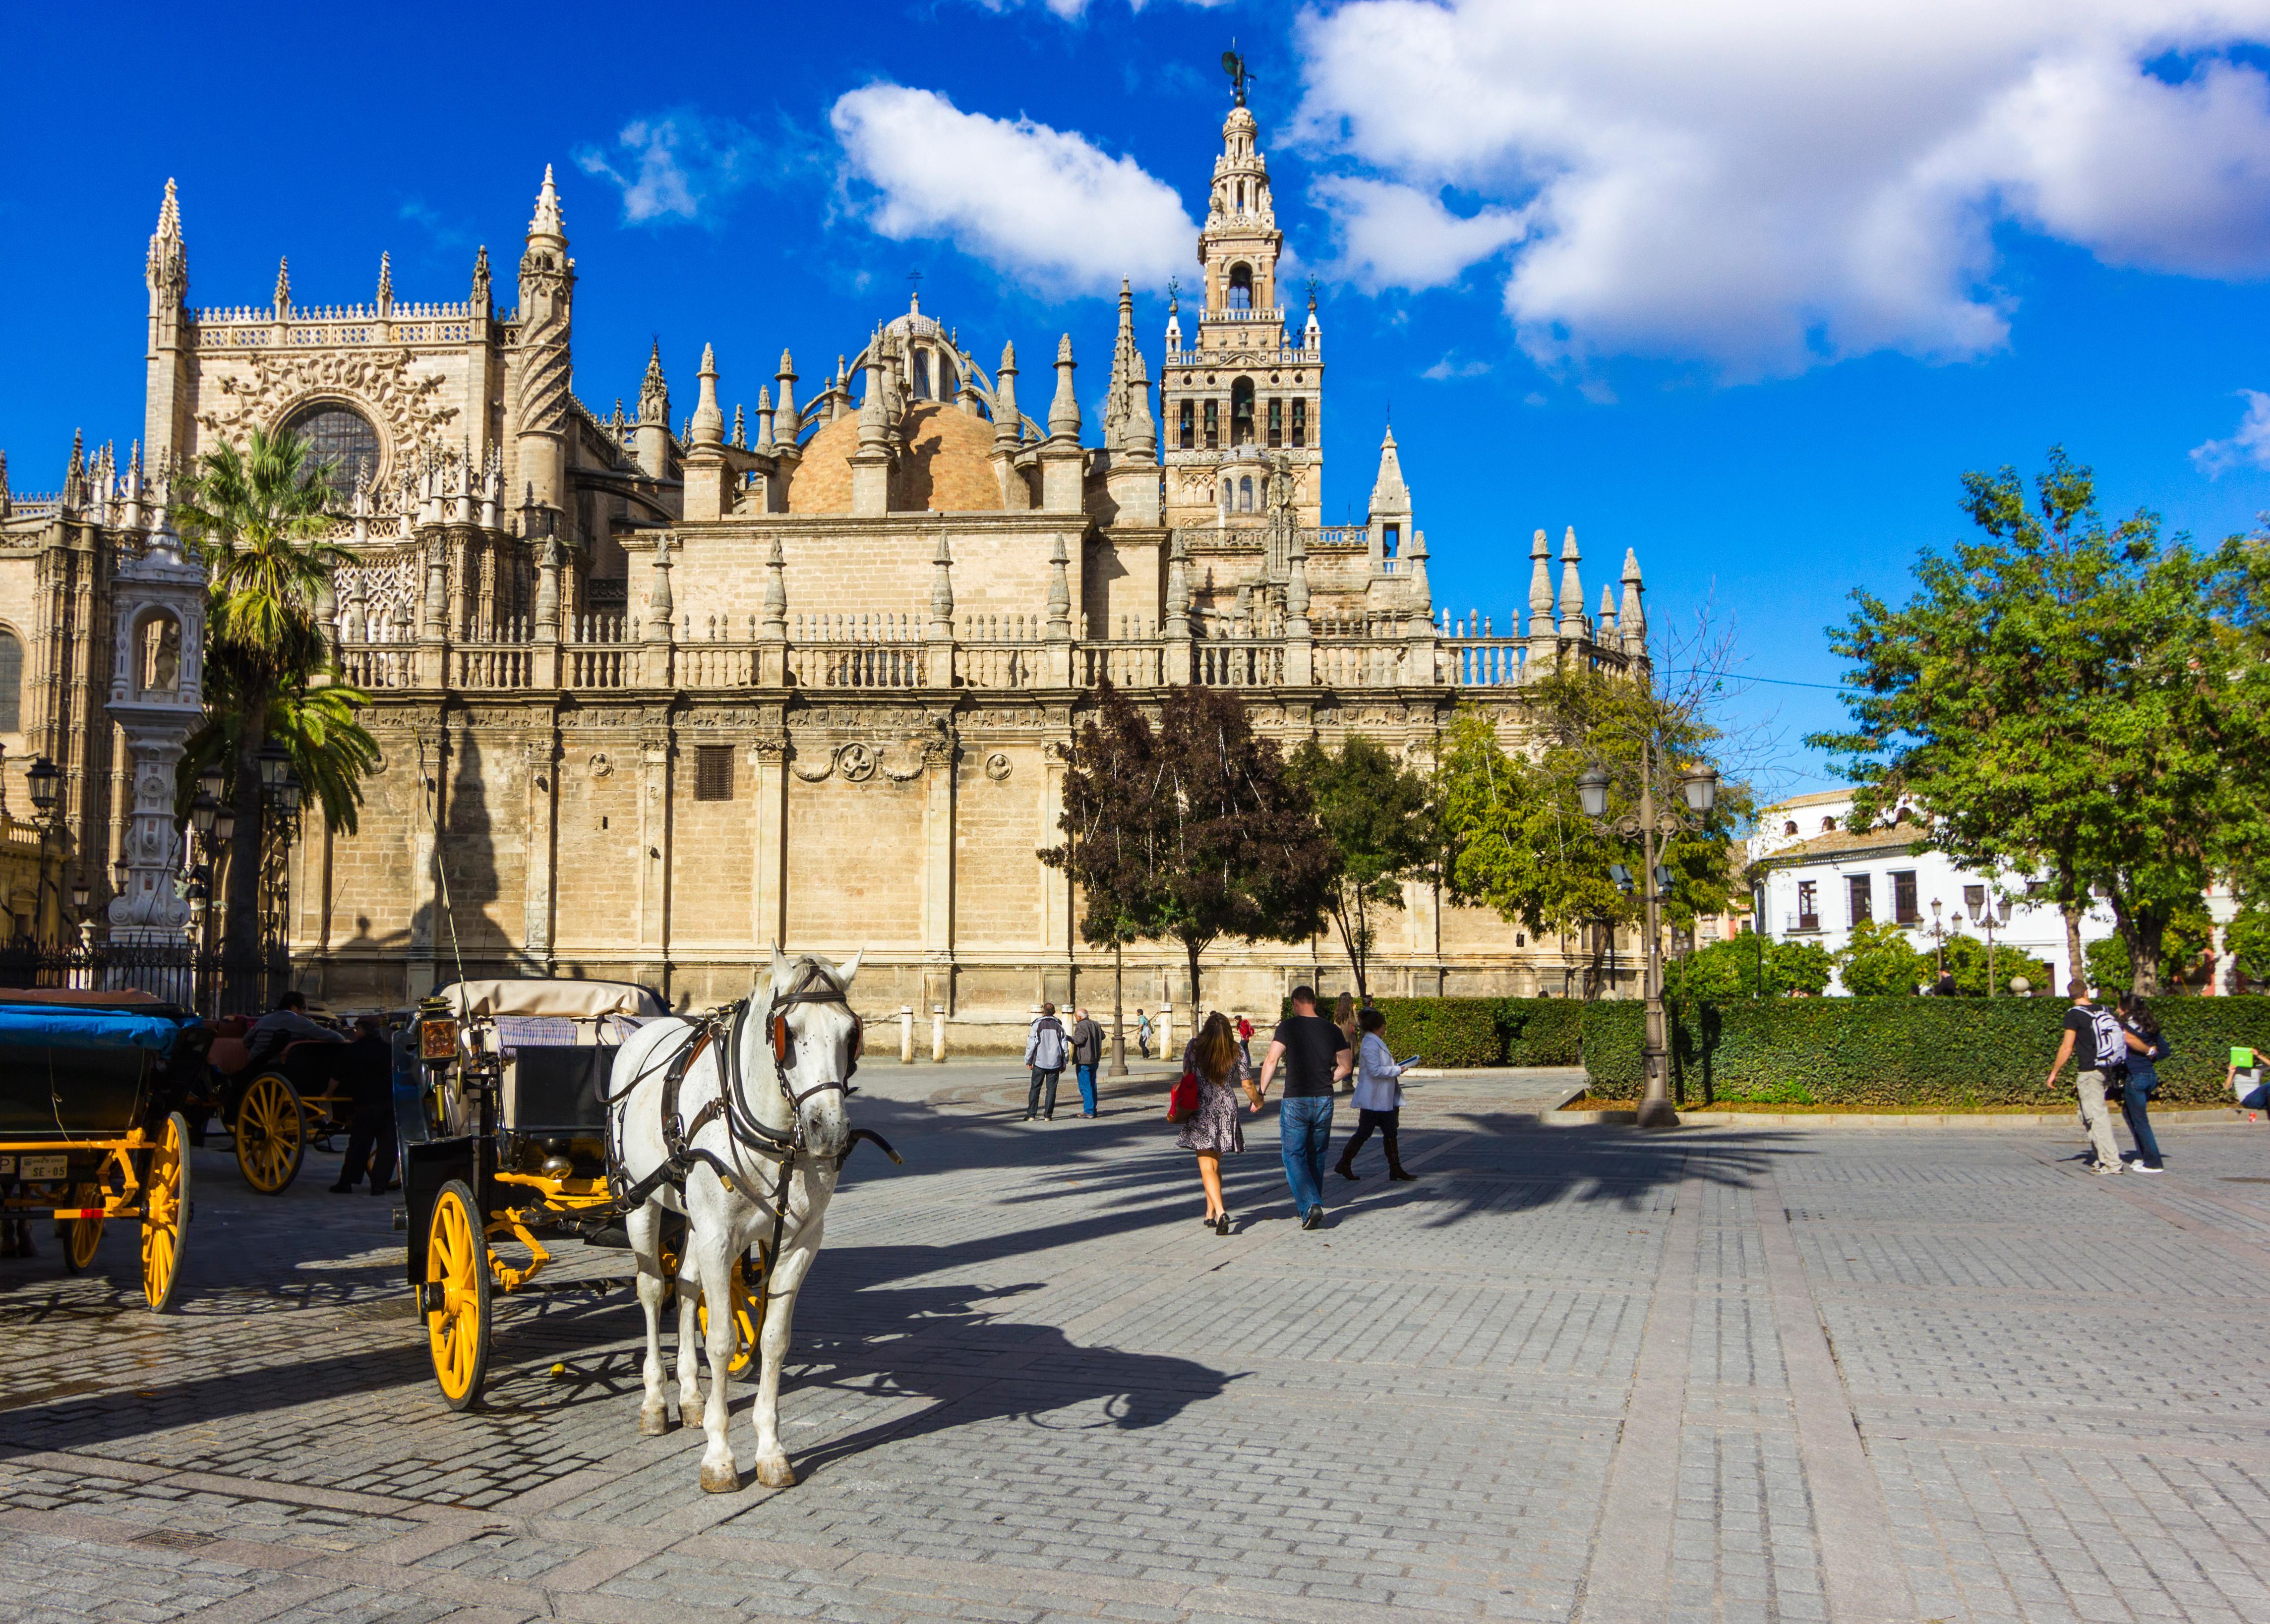 Gap Year Program - Seville Abroad: High School Exchange Program in Spain  3